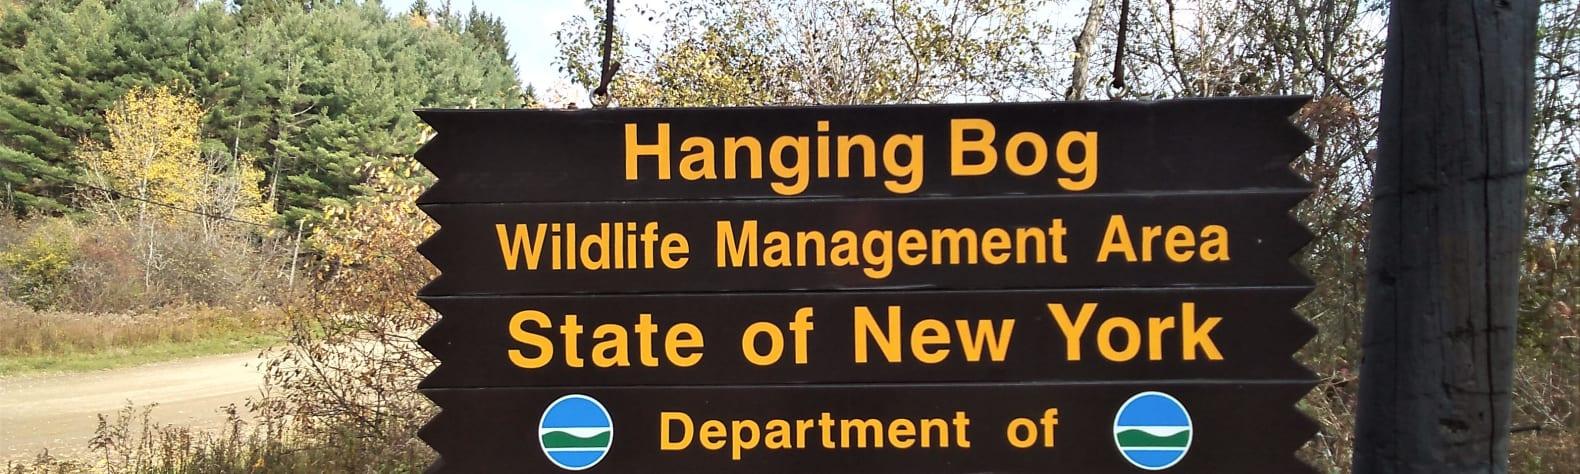 Hanging Bog Big Bass Serenity